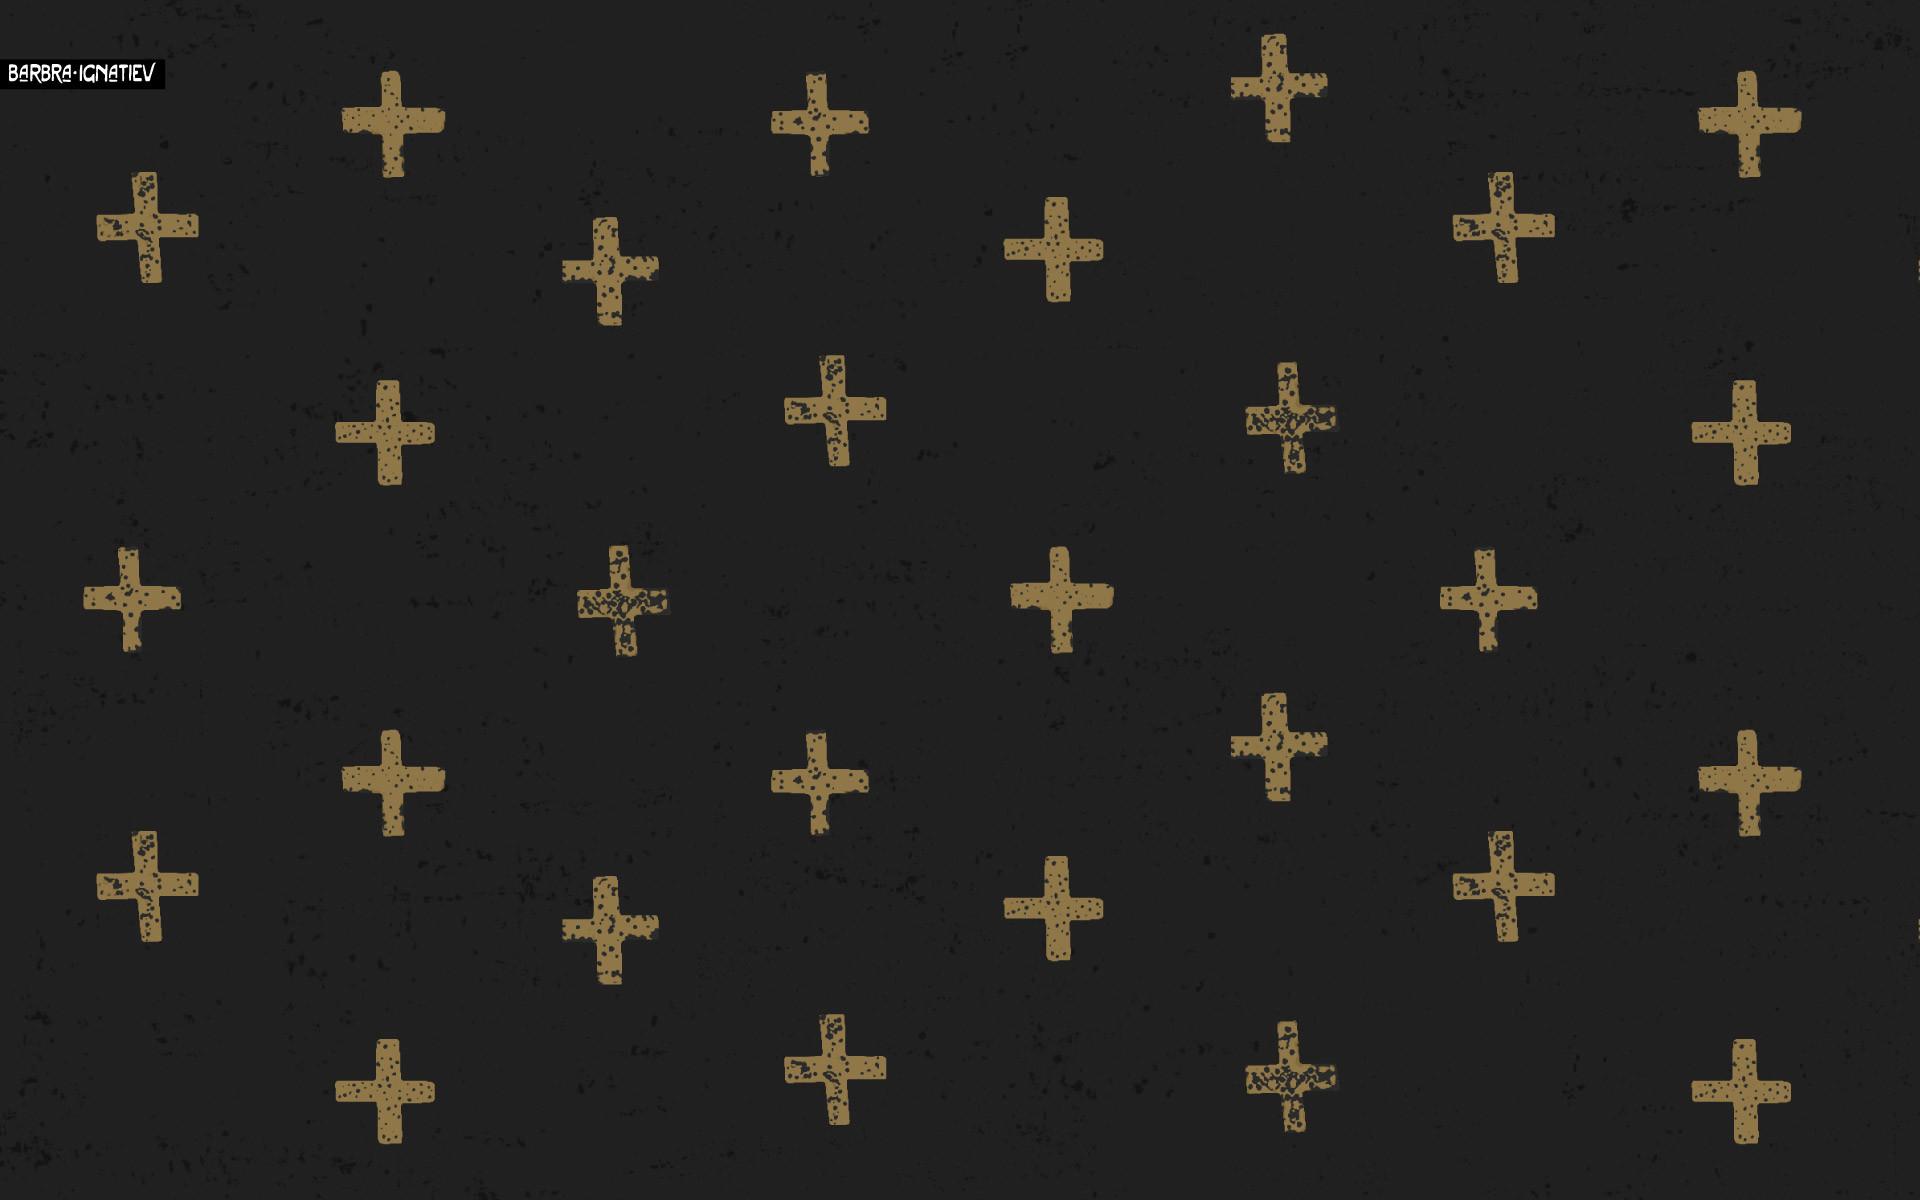 Black And Gold Chevron Wallpaper 11 Hd Wallpaper. Black And Gold Chevron  Wallpaper 11 Hd Wallpaper